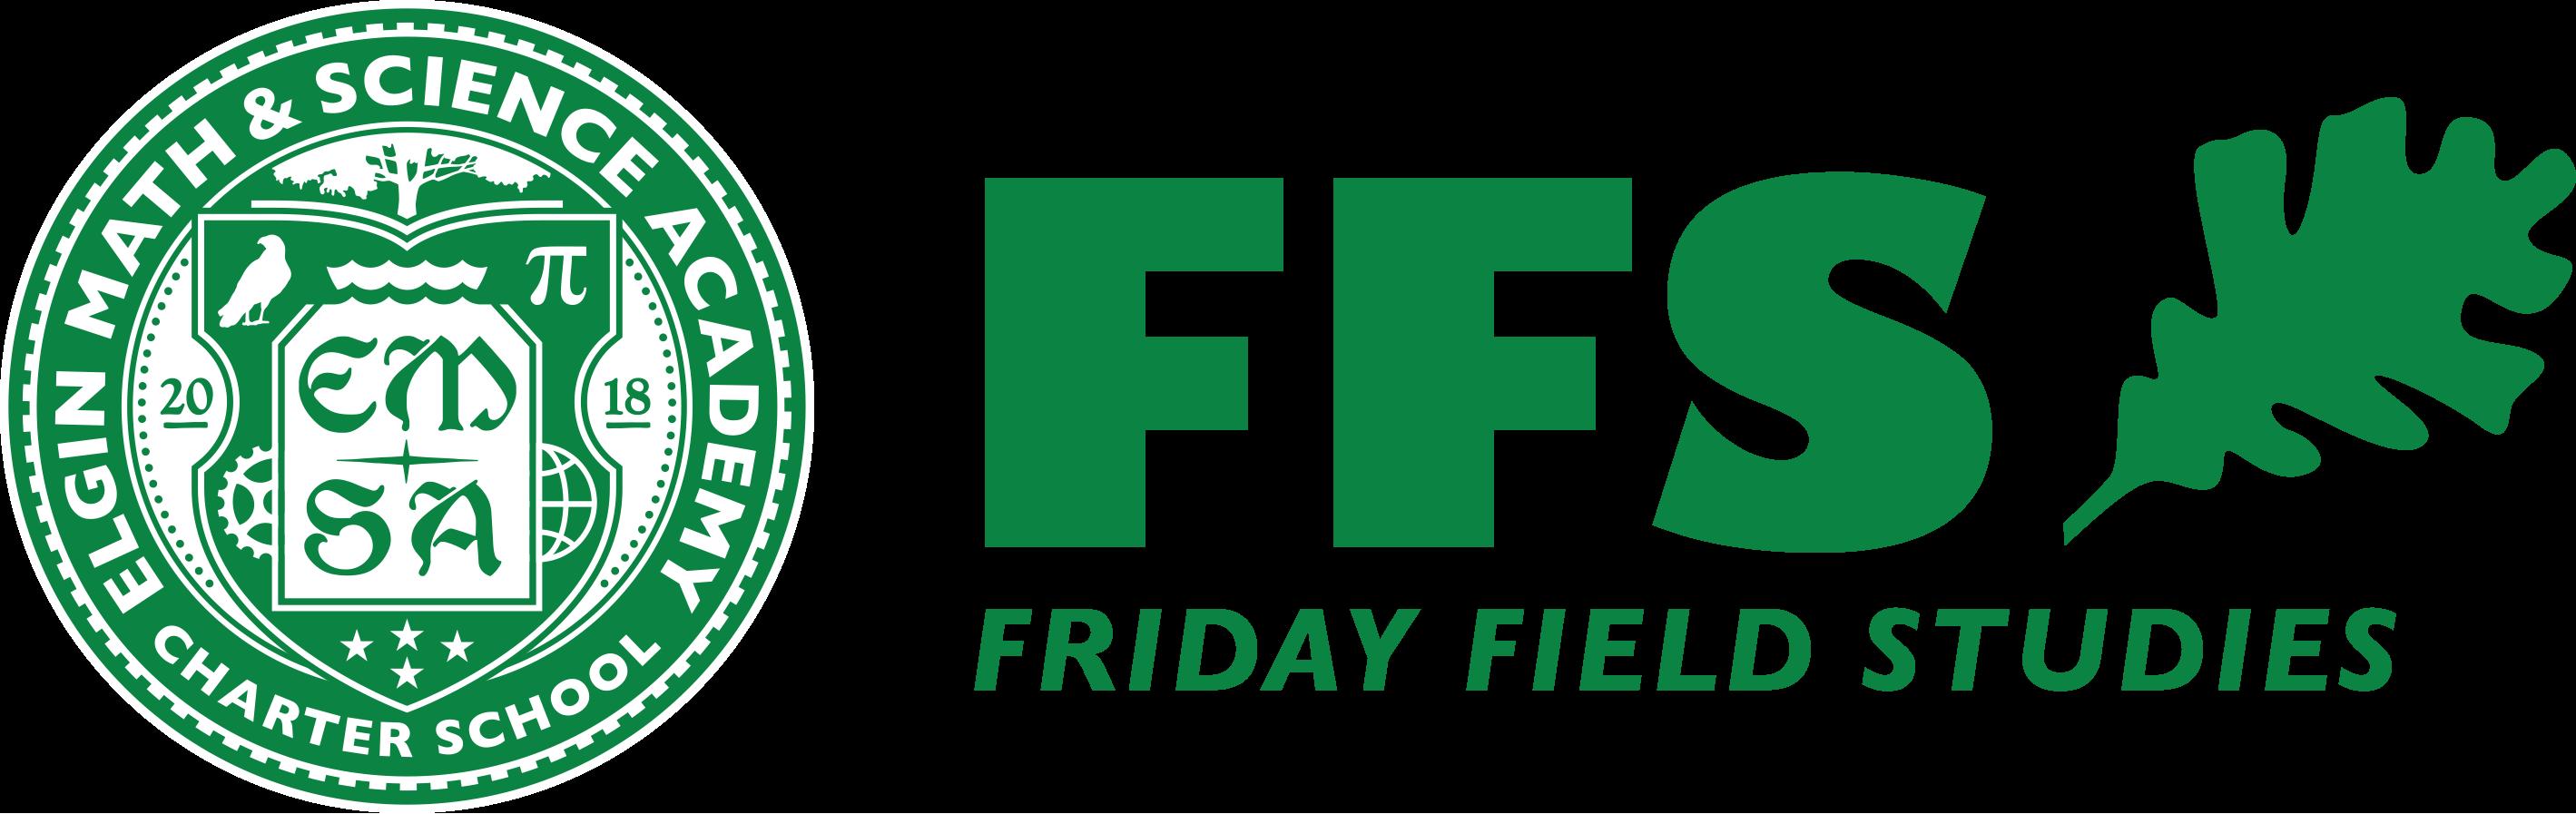 FridayFieldLogo.png